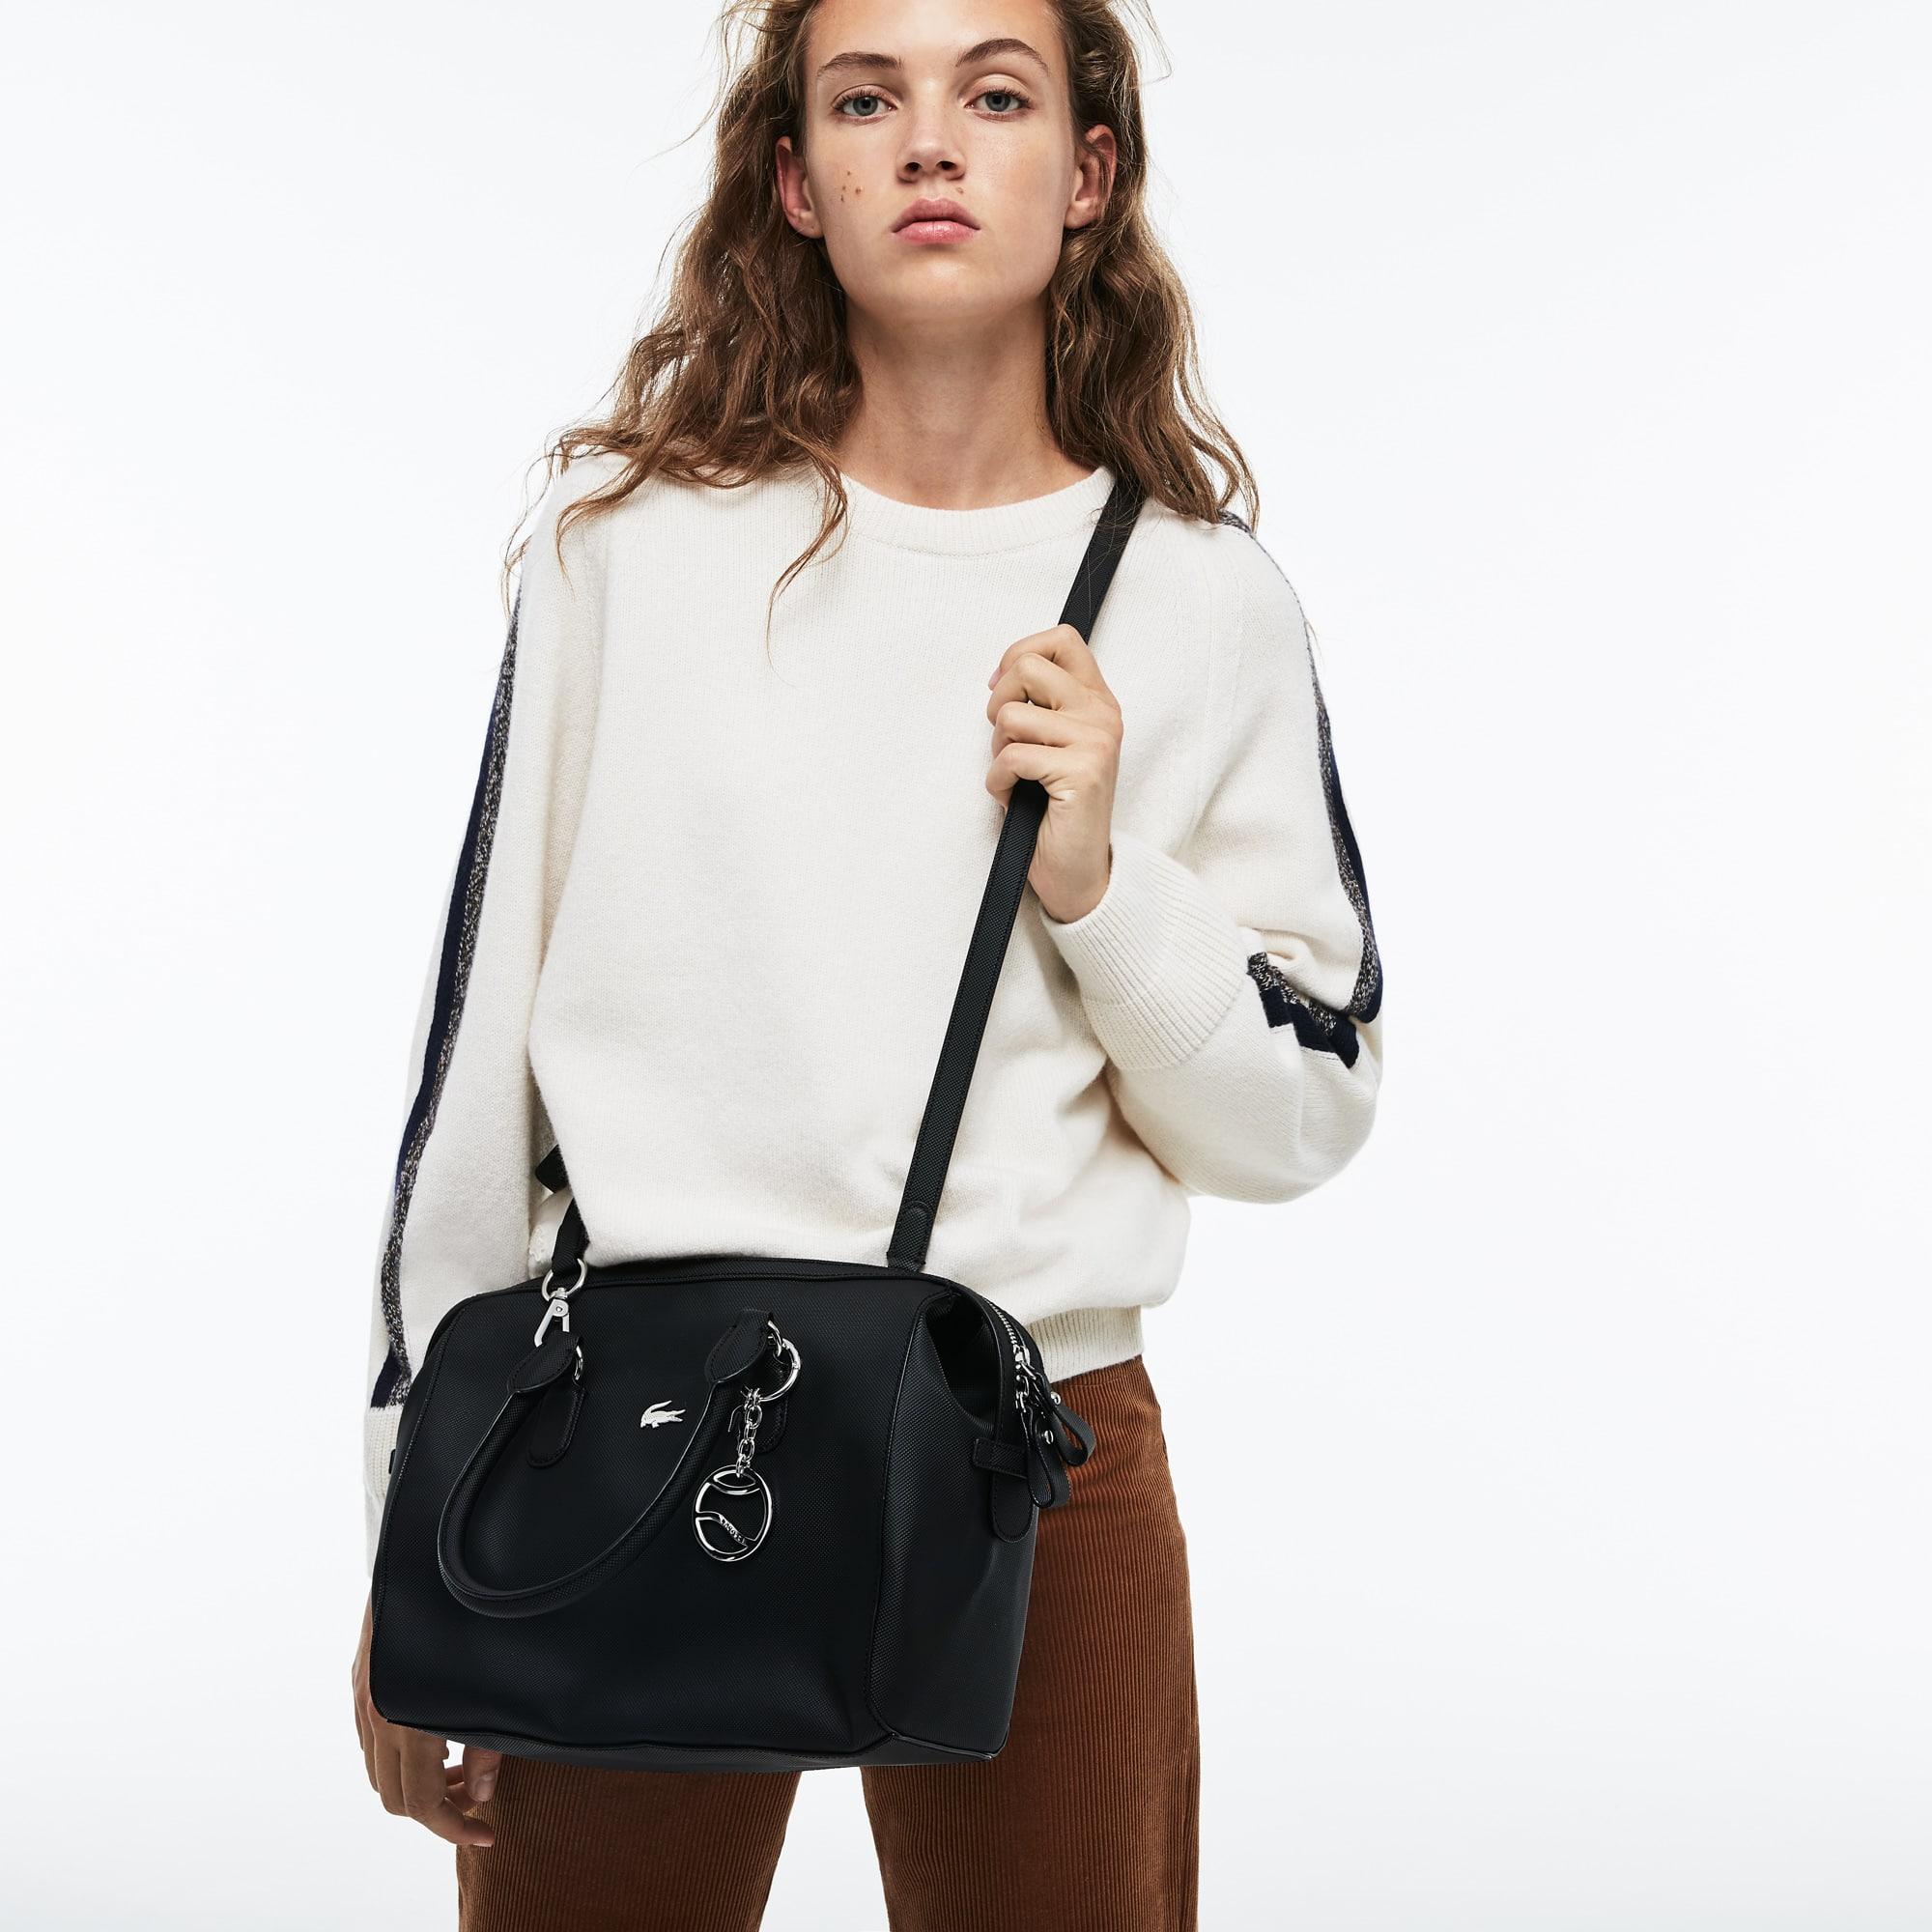 Damen-Boston Tasche DAILY CLASSIC aus beschichtetem Piqué-Canvas